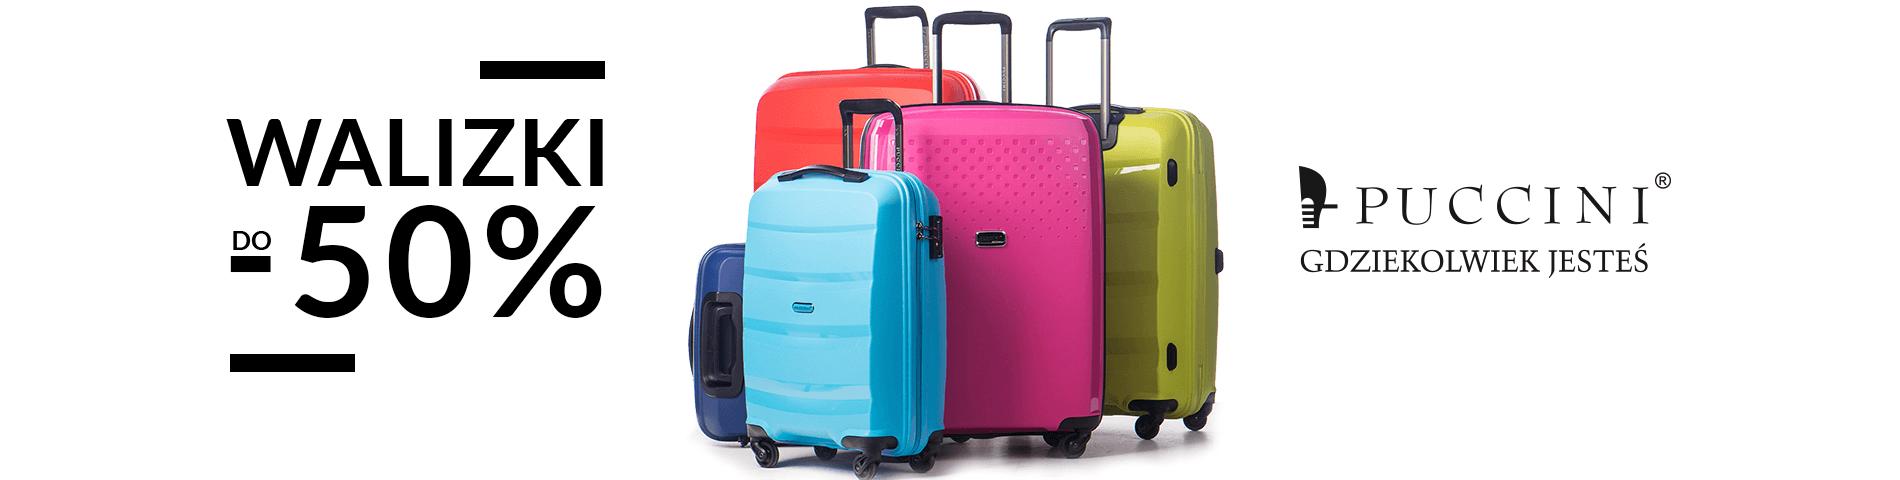 4e74b0e0da10b Puccini: do 50% zniżki na walizki